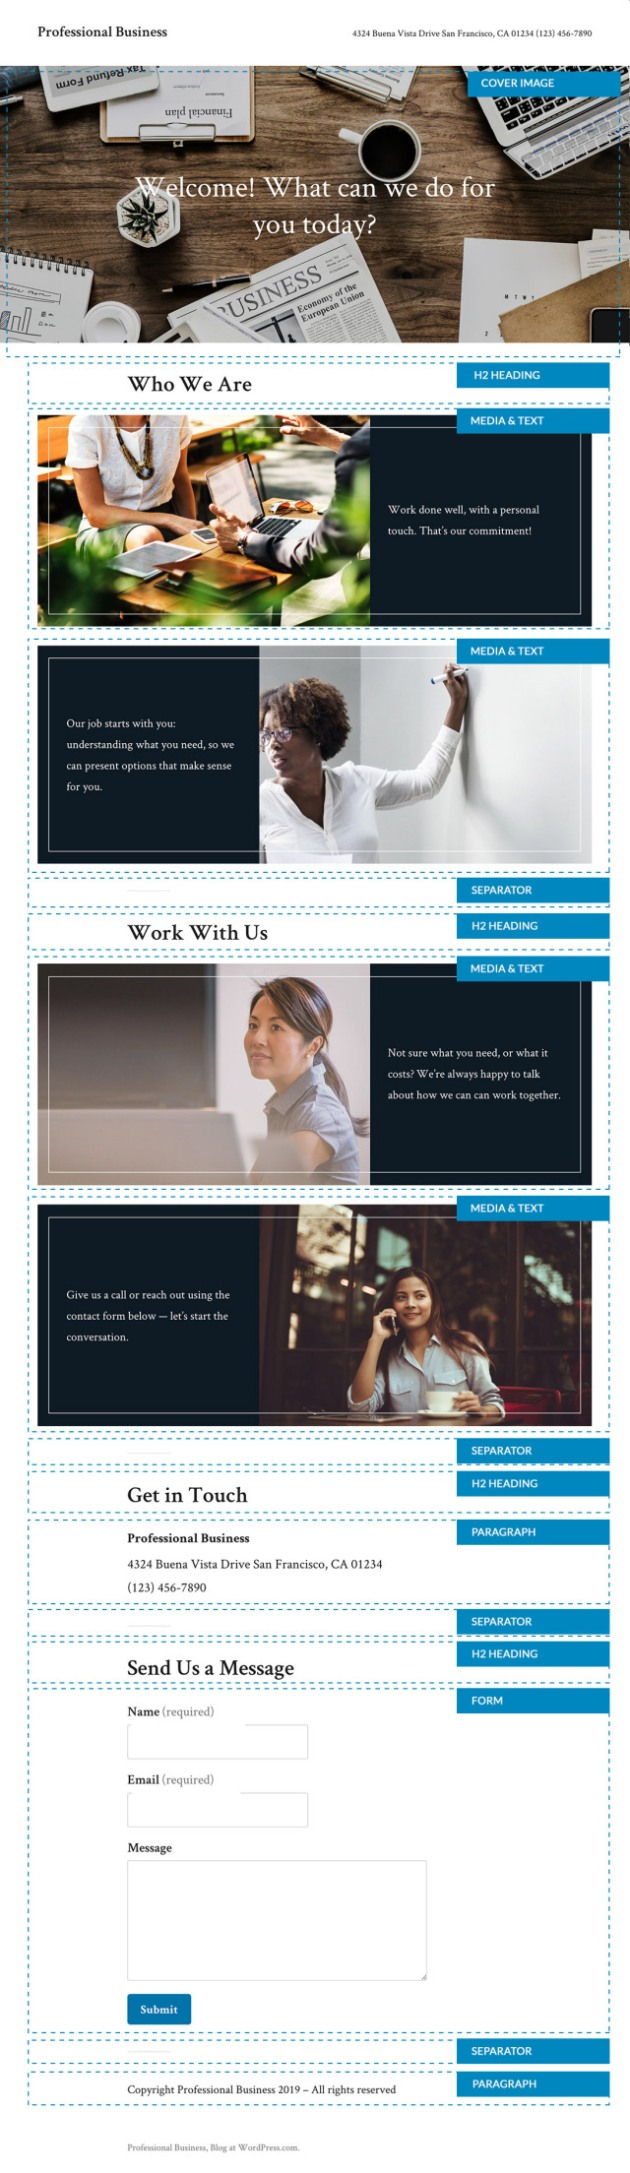 Wordpress Twenty Nineteen (2019) child theme to create Free Professional Business Website